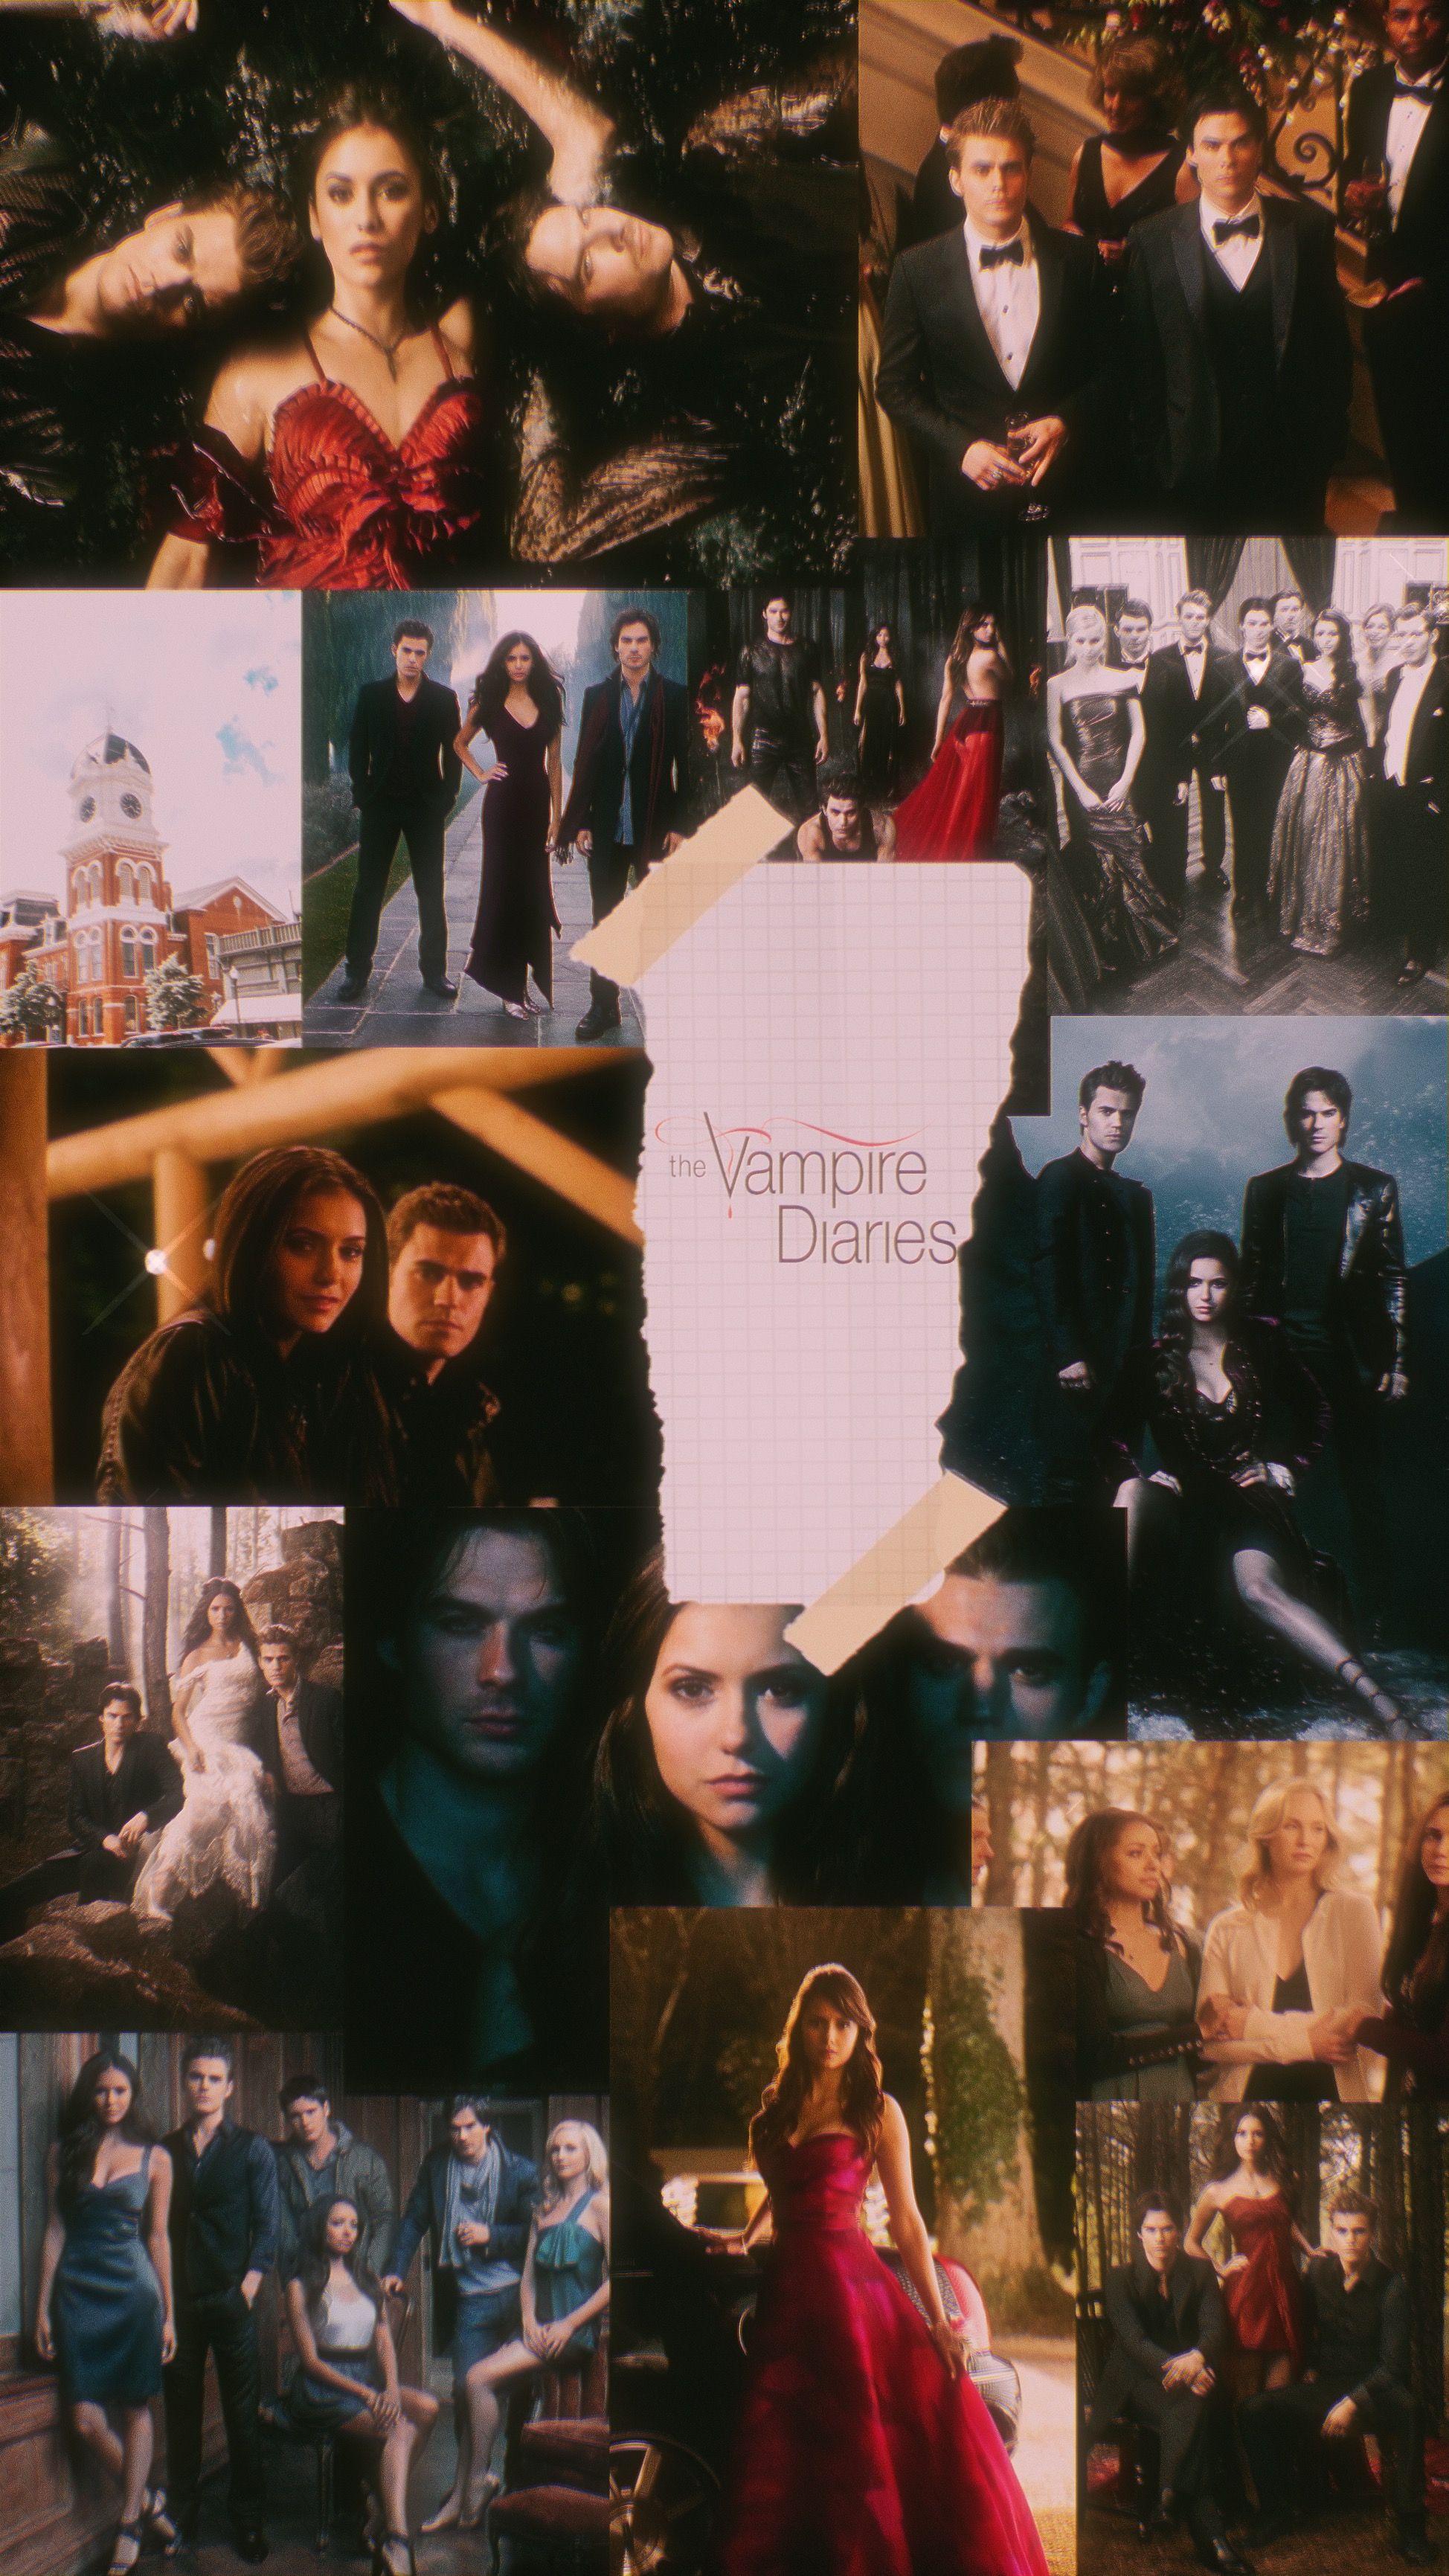 The Vampire Diaries Vampire Diaries Wallpaper Vampire Diaries Vampire Diaries Poster